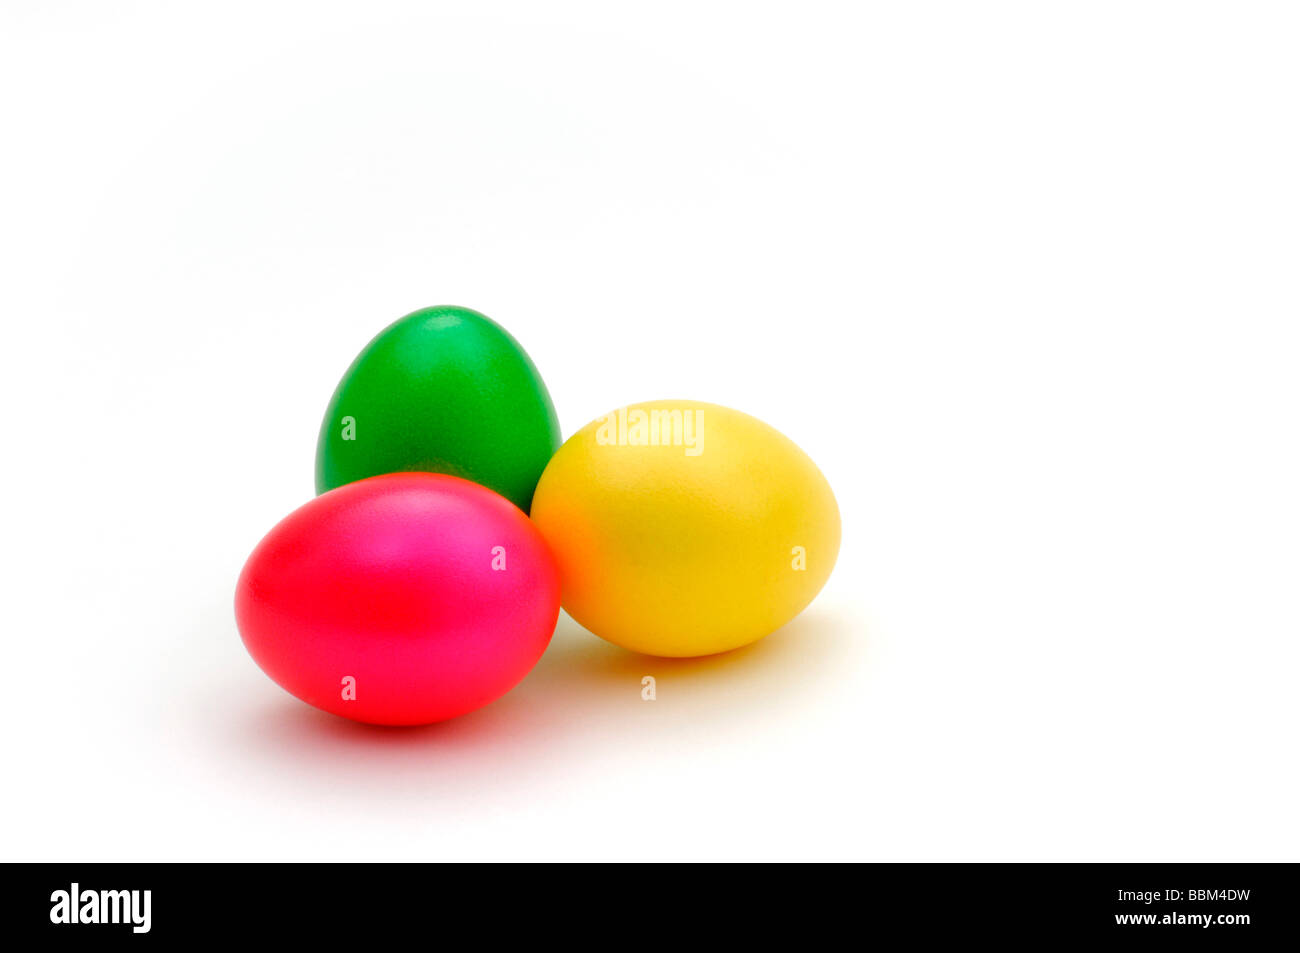 Coloured Easter eggs, Easter - Stock Image